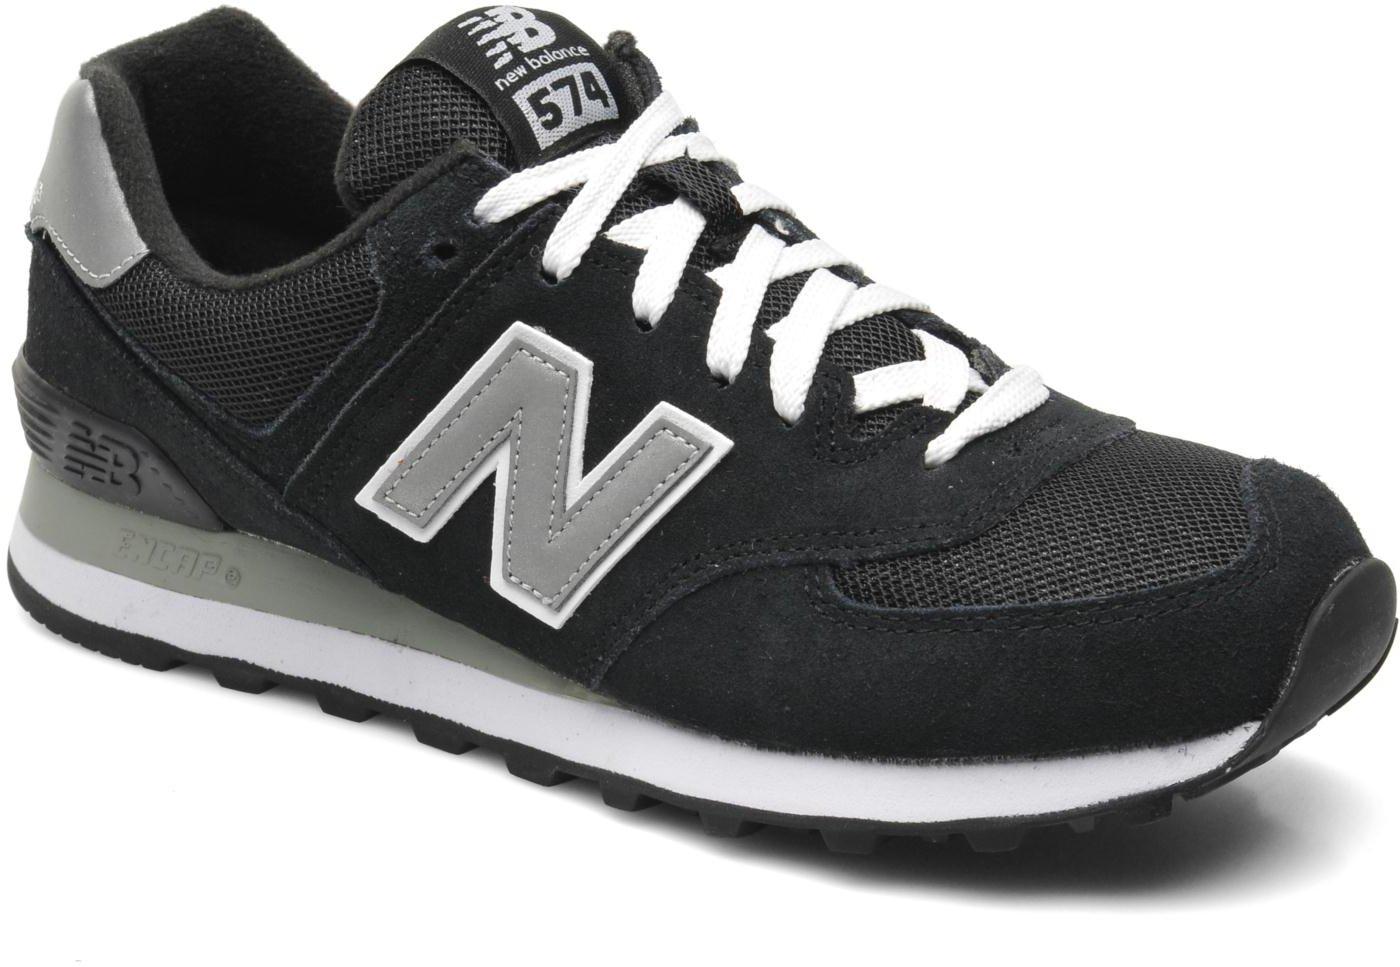 New balance blau Sneaker Turnschuh Schuhe Herrenschuhe 42,5 42